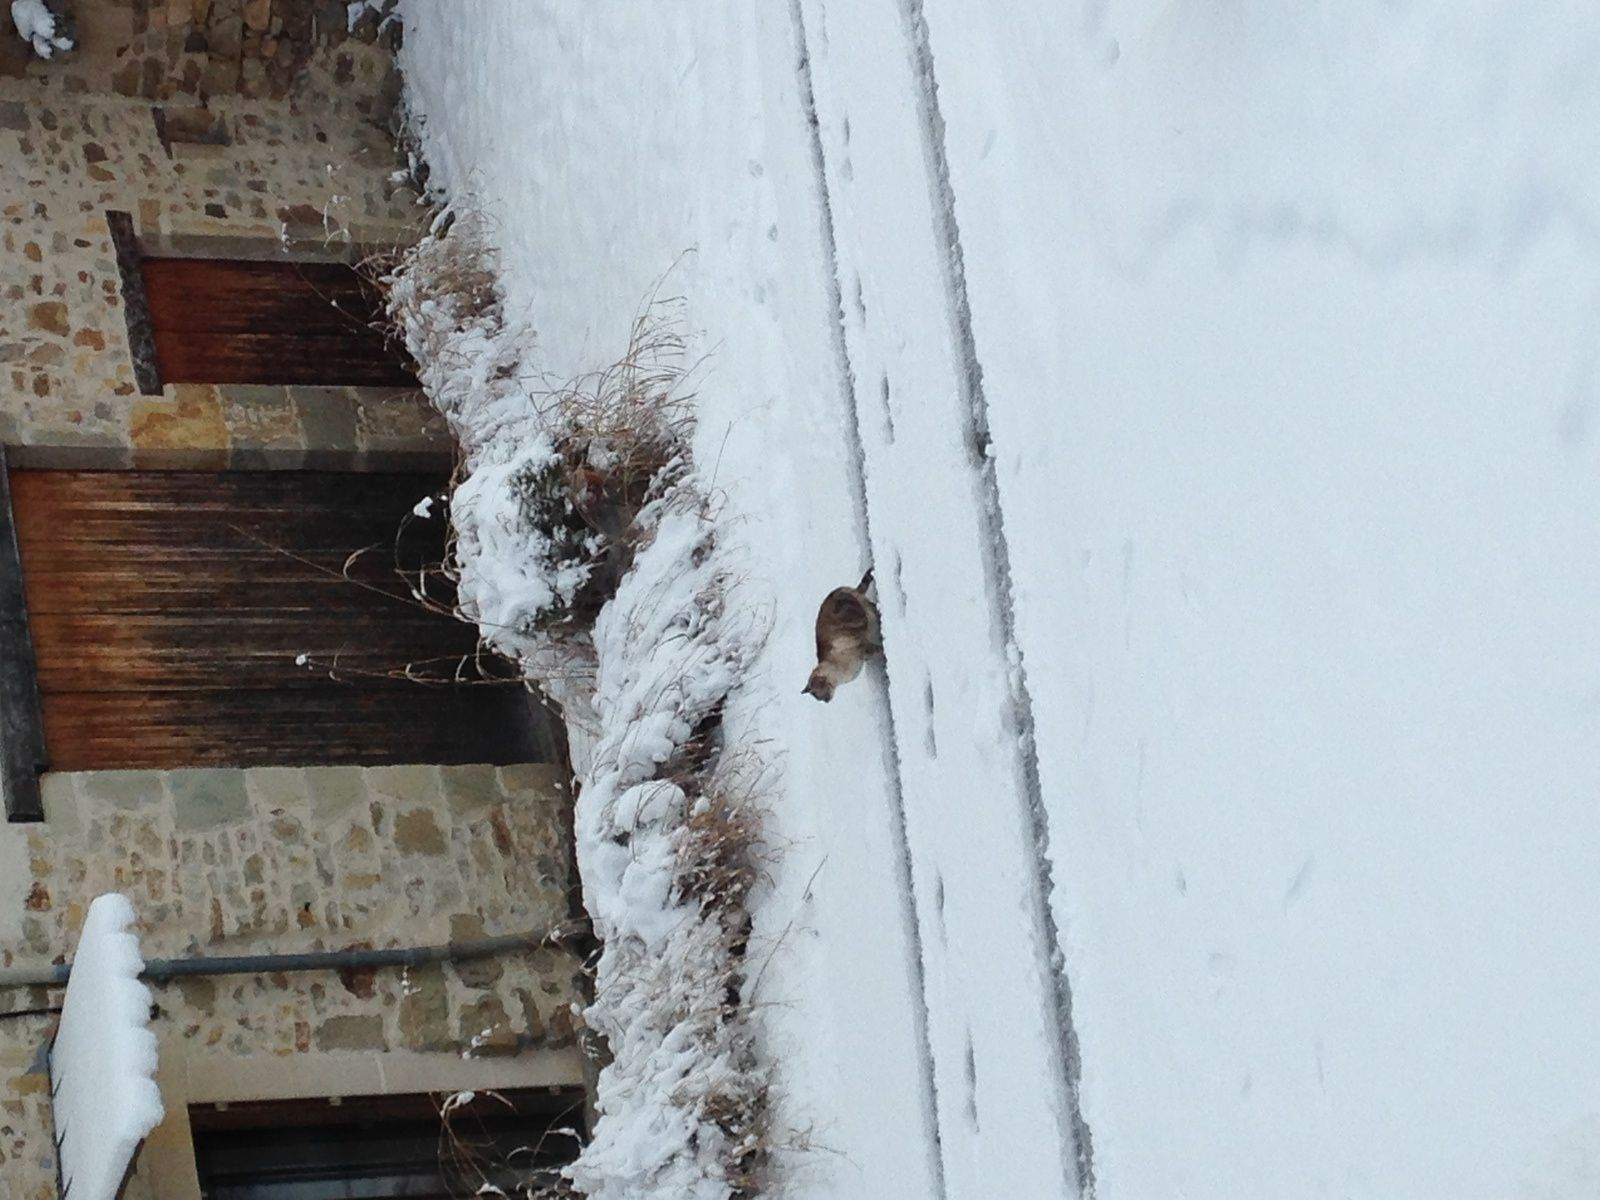 #neige #egliseneuve-pres-billom #auvergne #france # charlotteblabla